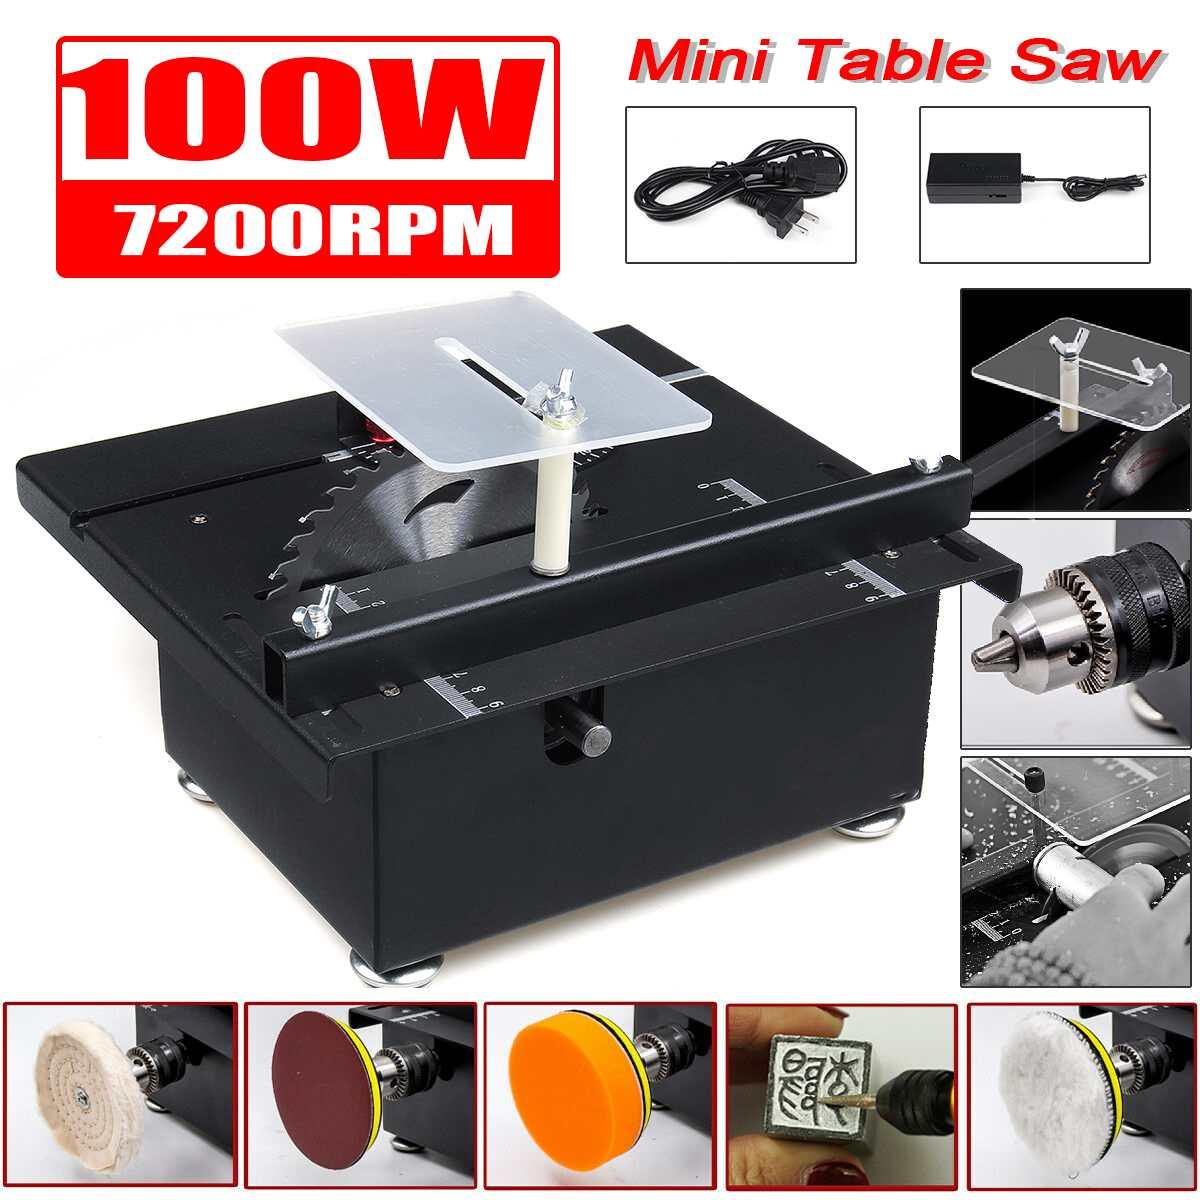 7200rpm Mini Table Saw with Power Supply Handmade Woodworking Benchs DIY Cutting Polish Engraving Tool Mini Circular Saw